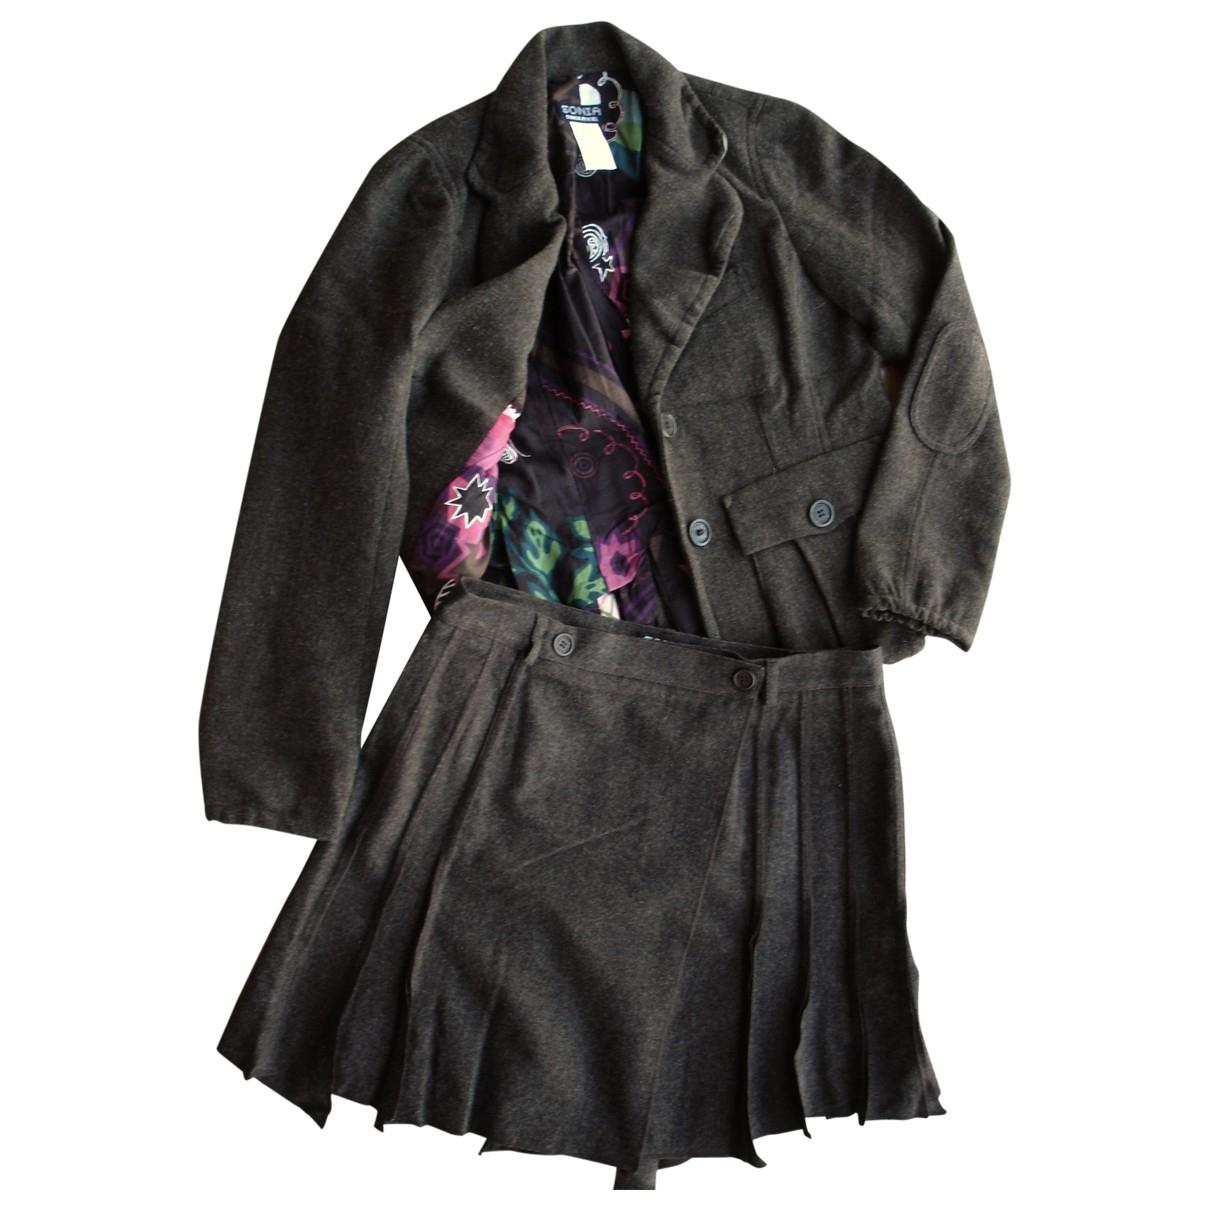 Sonia By Sonia Rykiel - Veste   pour femme en laine - marron